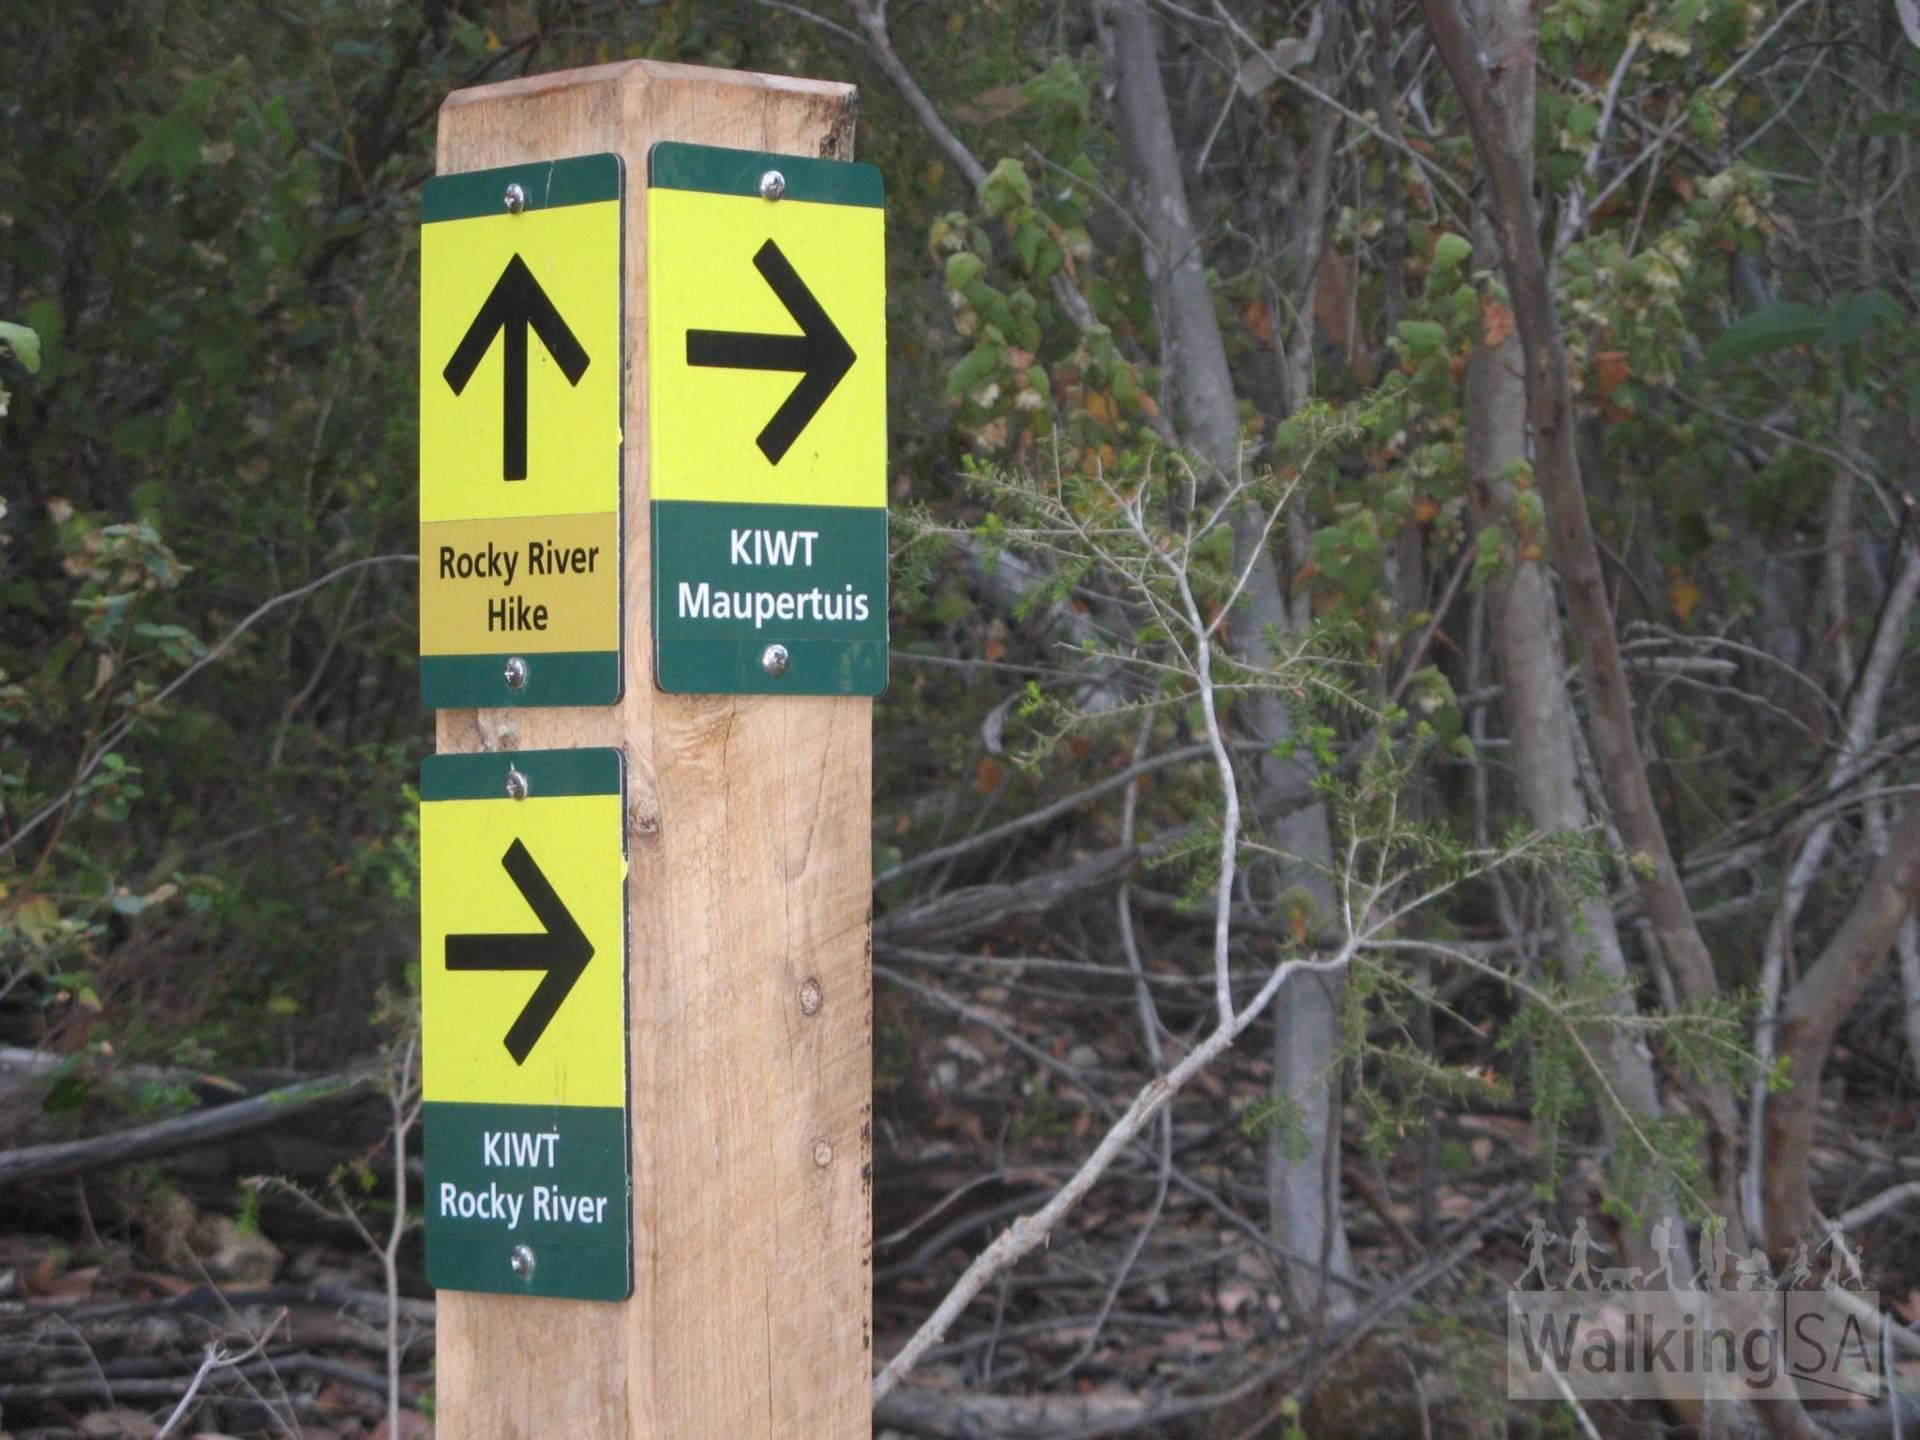 Kangaroo Island Wilderness Trail - Day 2: Maupertuis Section